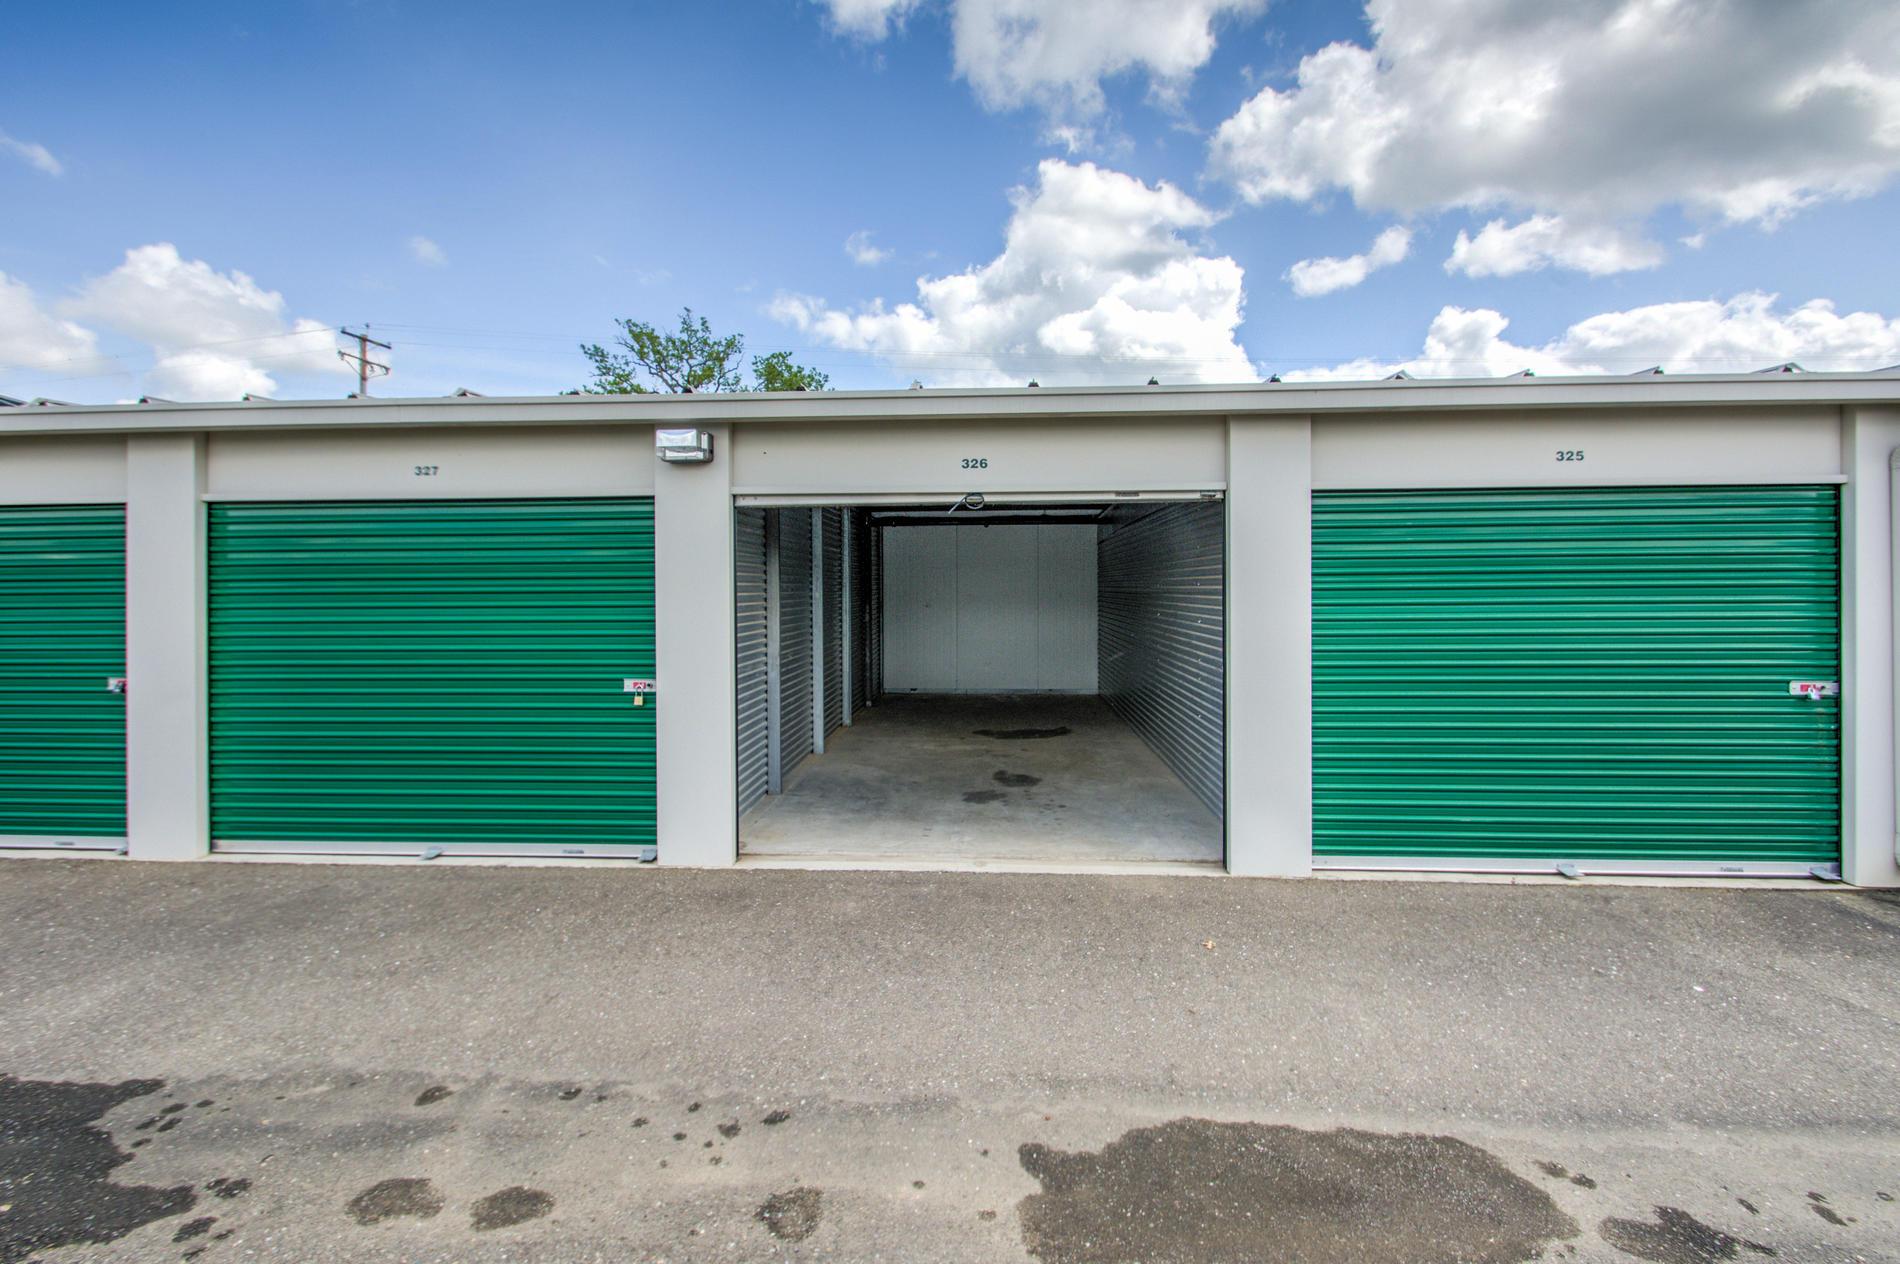 All ground-level easy-access self-storage units. Empire Mini Storage Cloverdale (707)827-9289